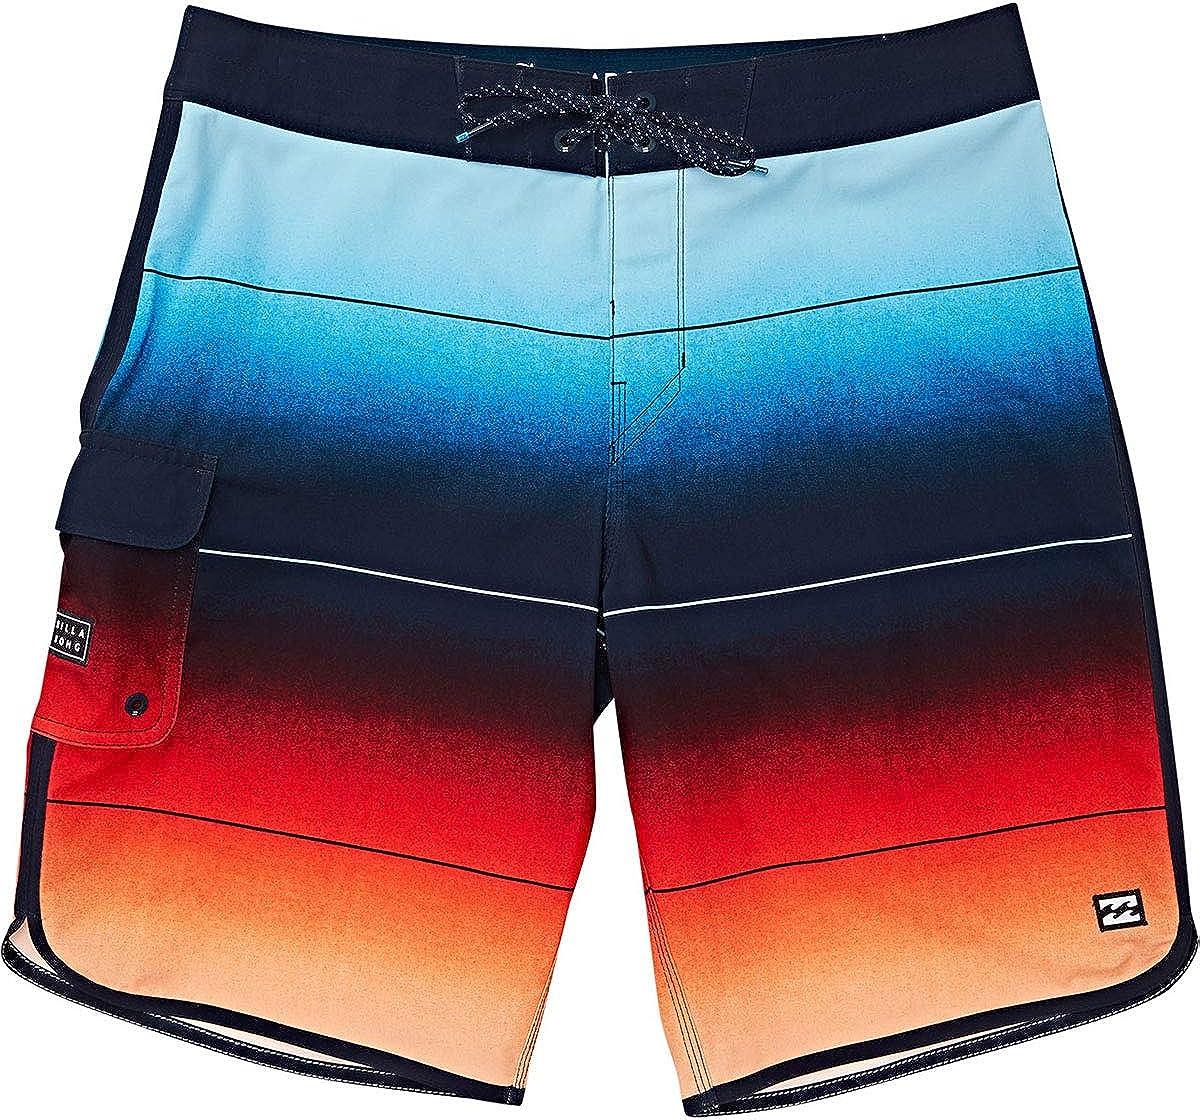 Billabong Mens 73 Stripe Pro Boardshort